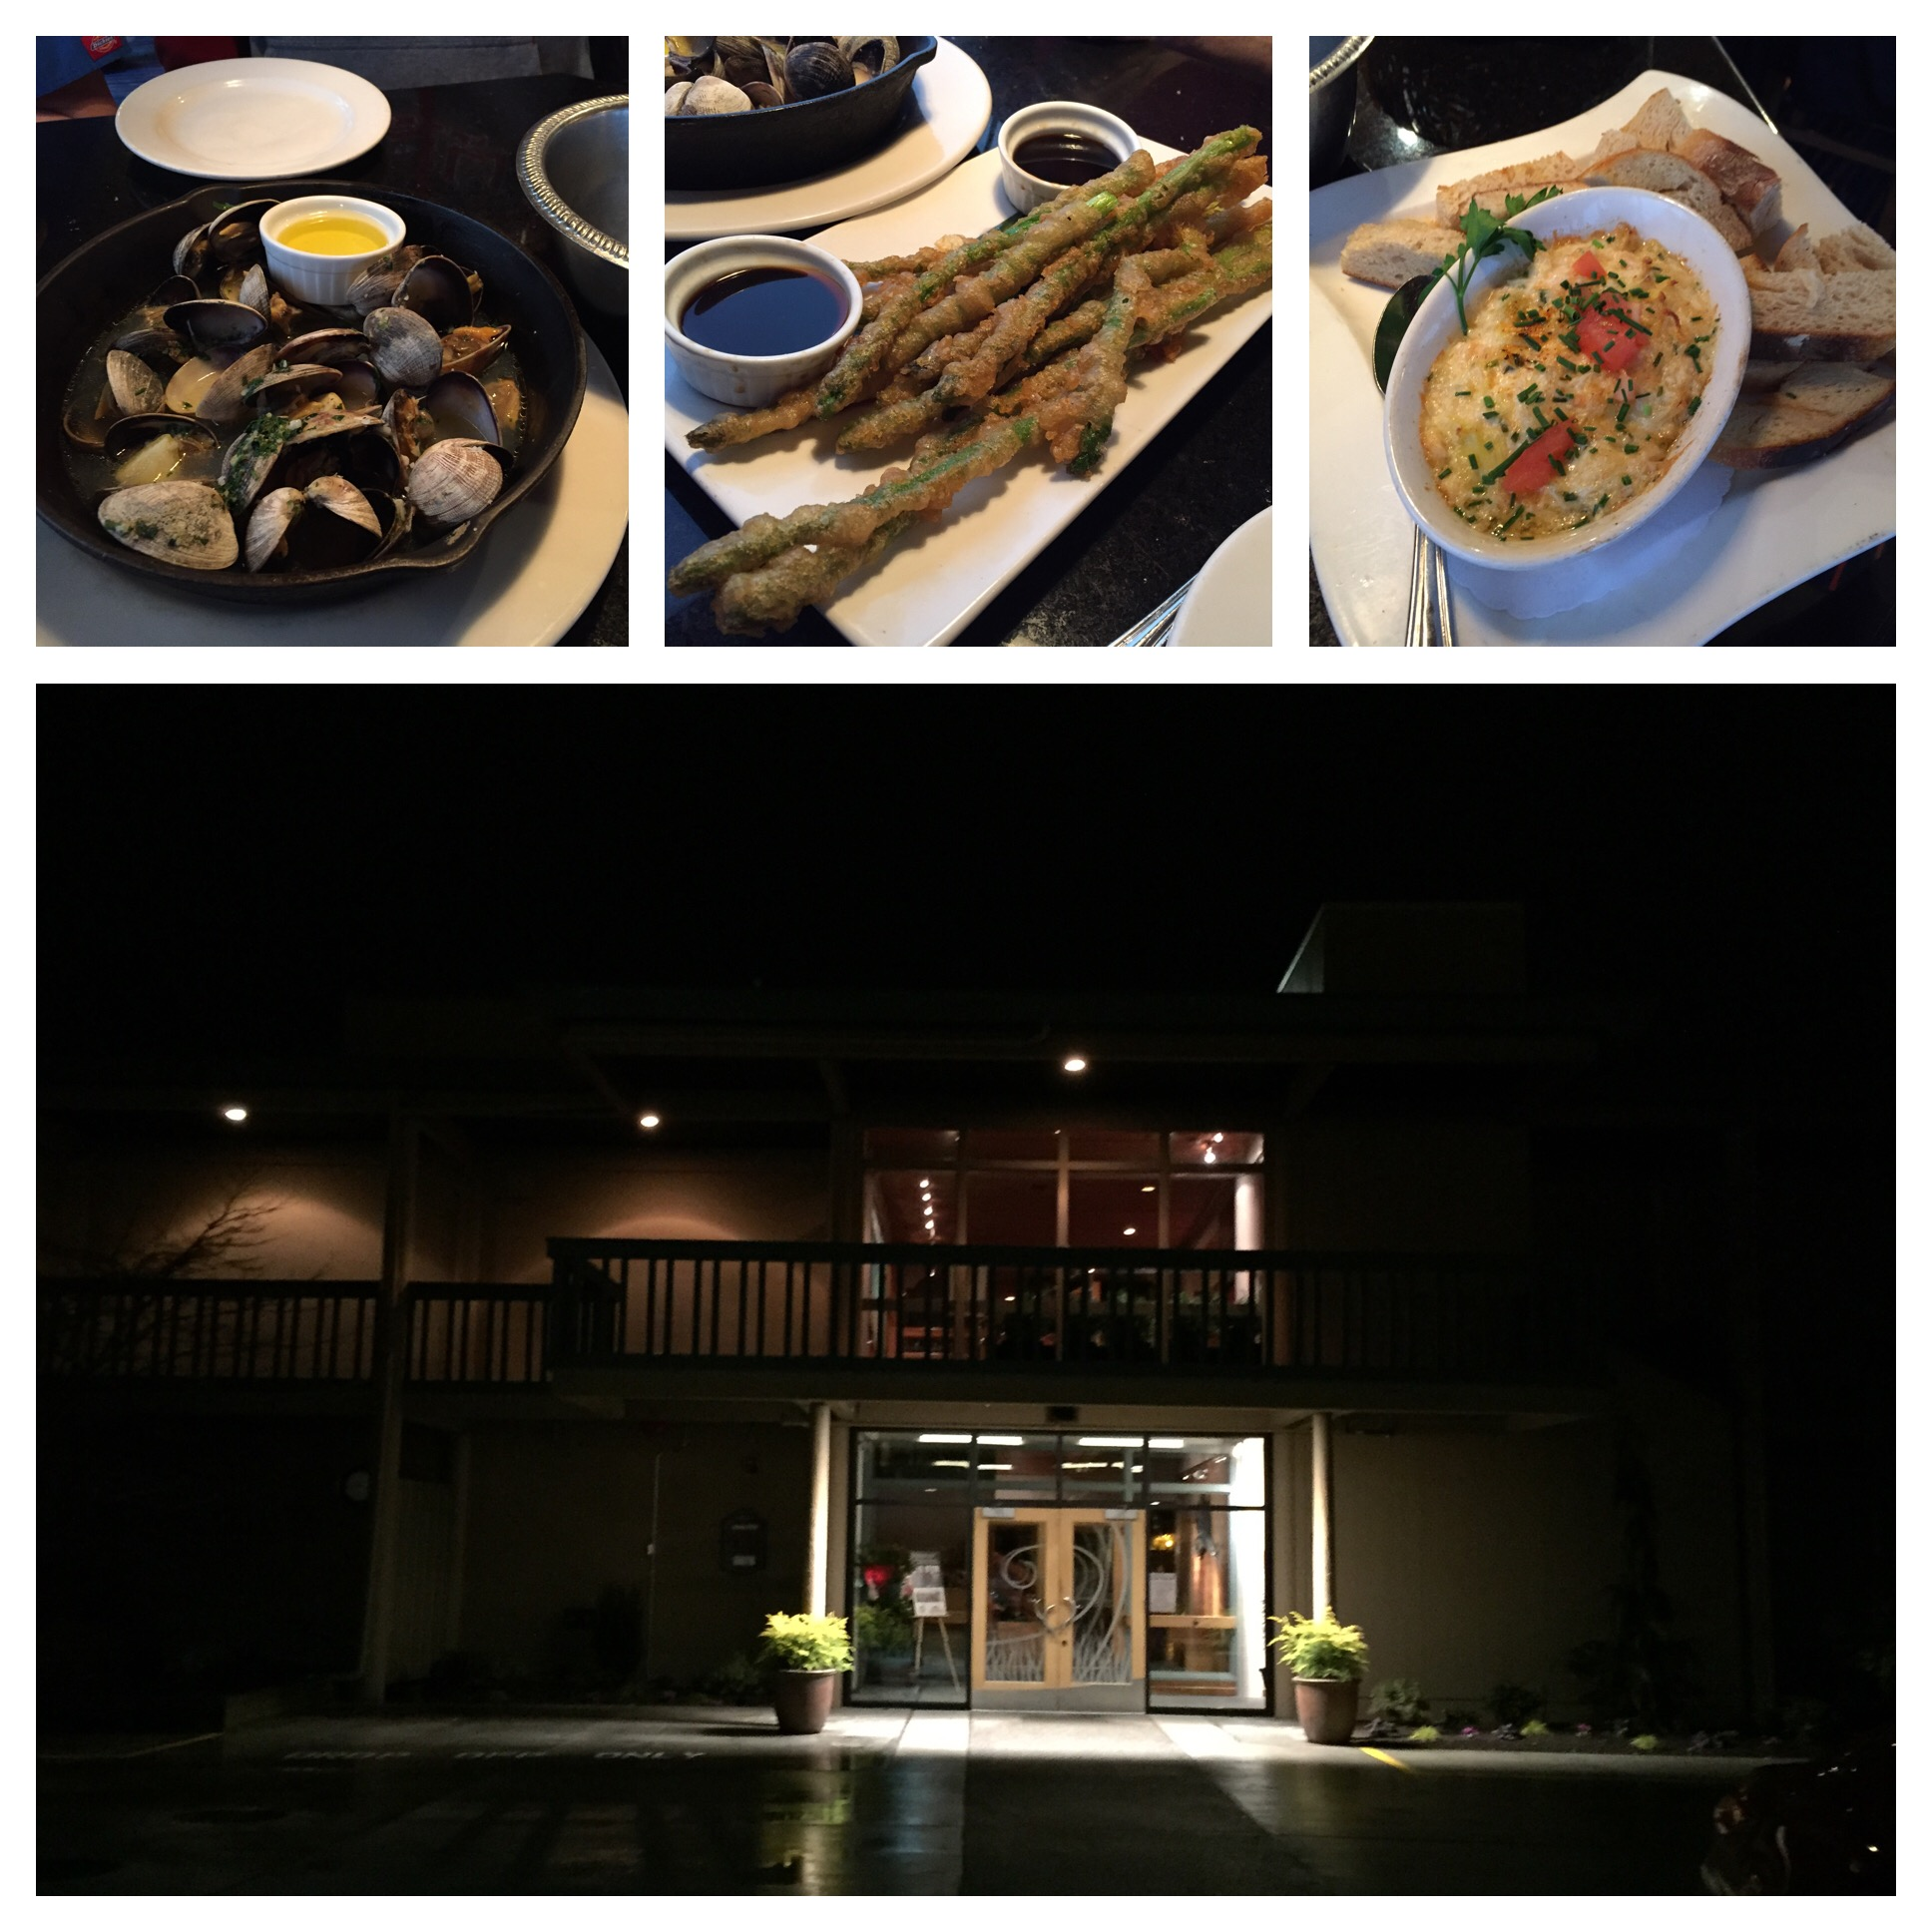 Tons of clams, tempura asparagus and artichoke dip - all delicious!